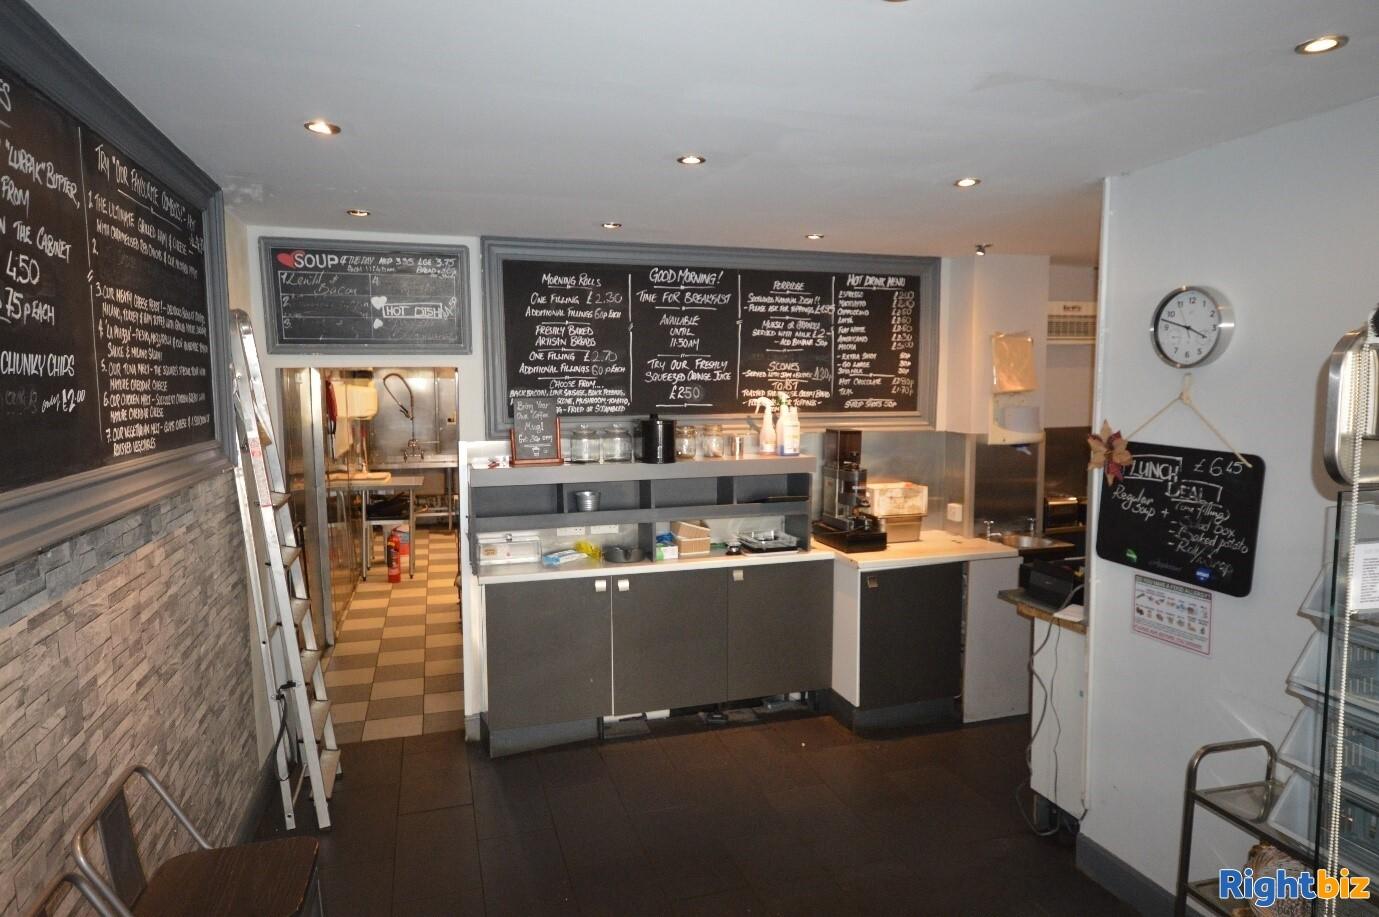 Full Class 3 hot food takeaway in Edinburgh city centre (ref 1396) - Image 3